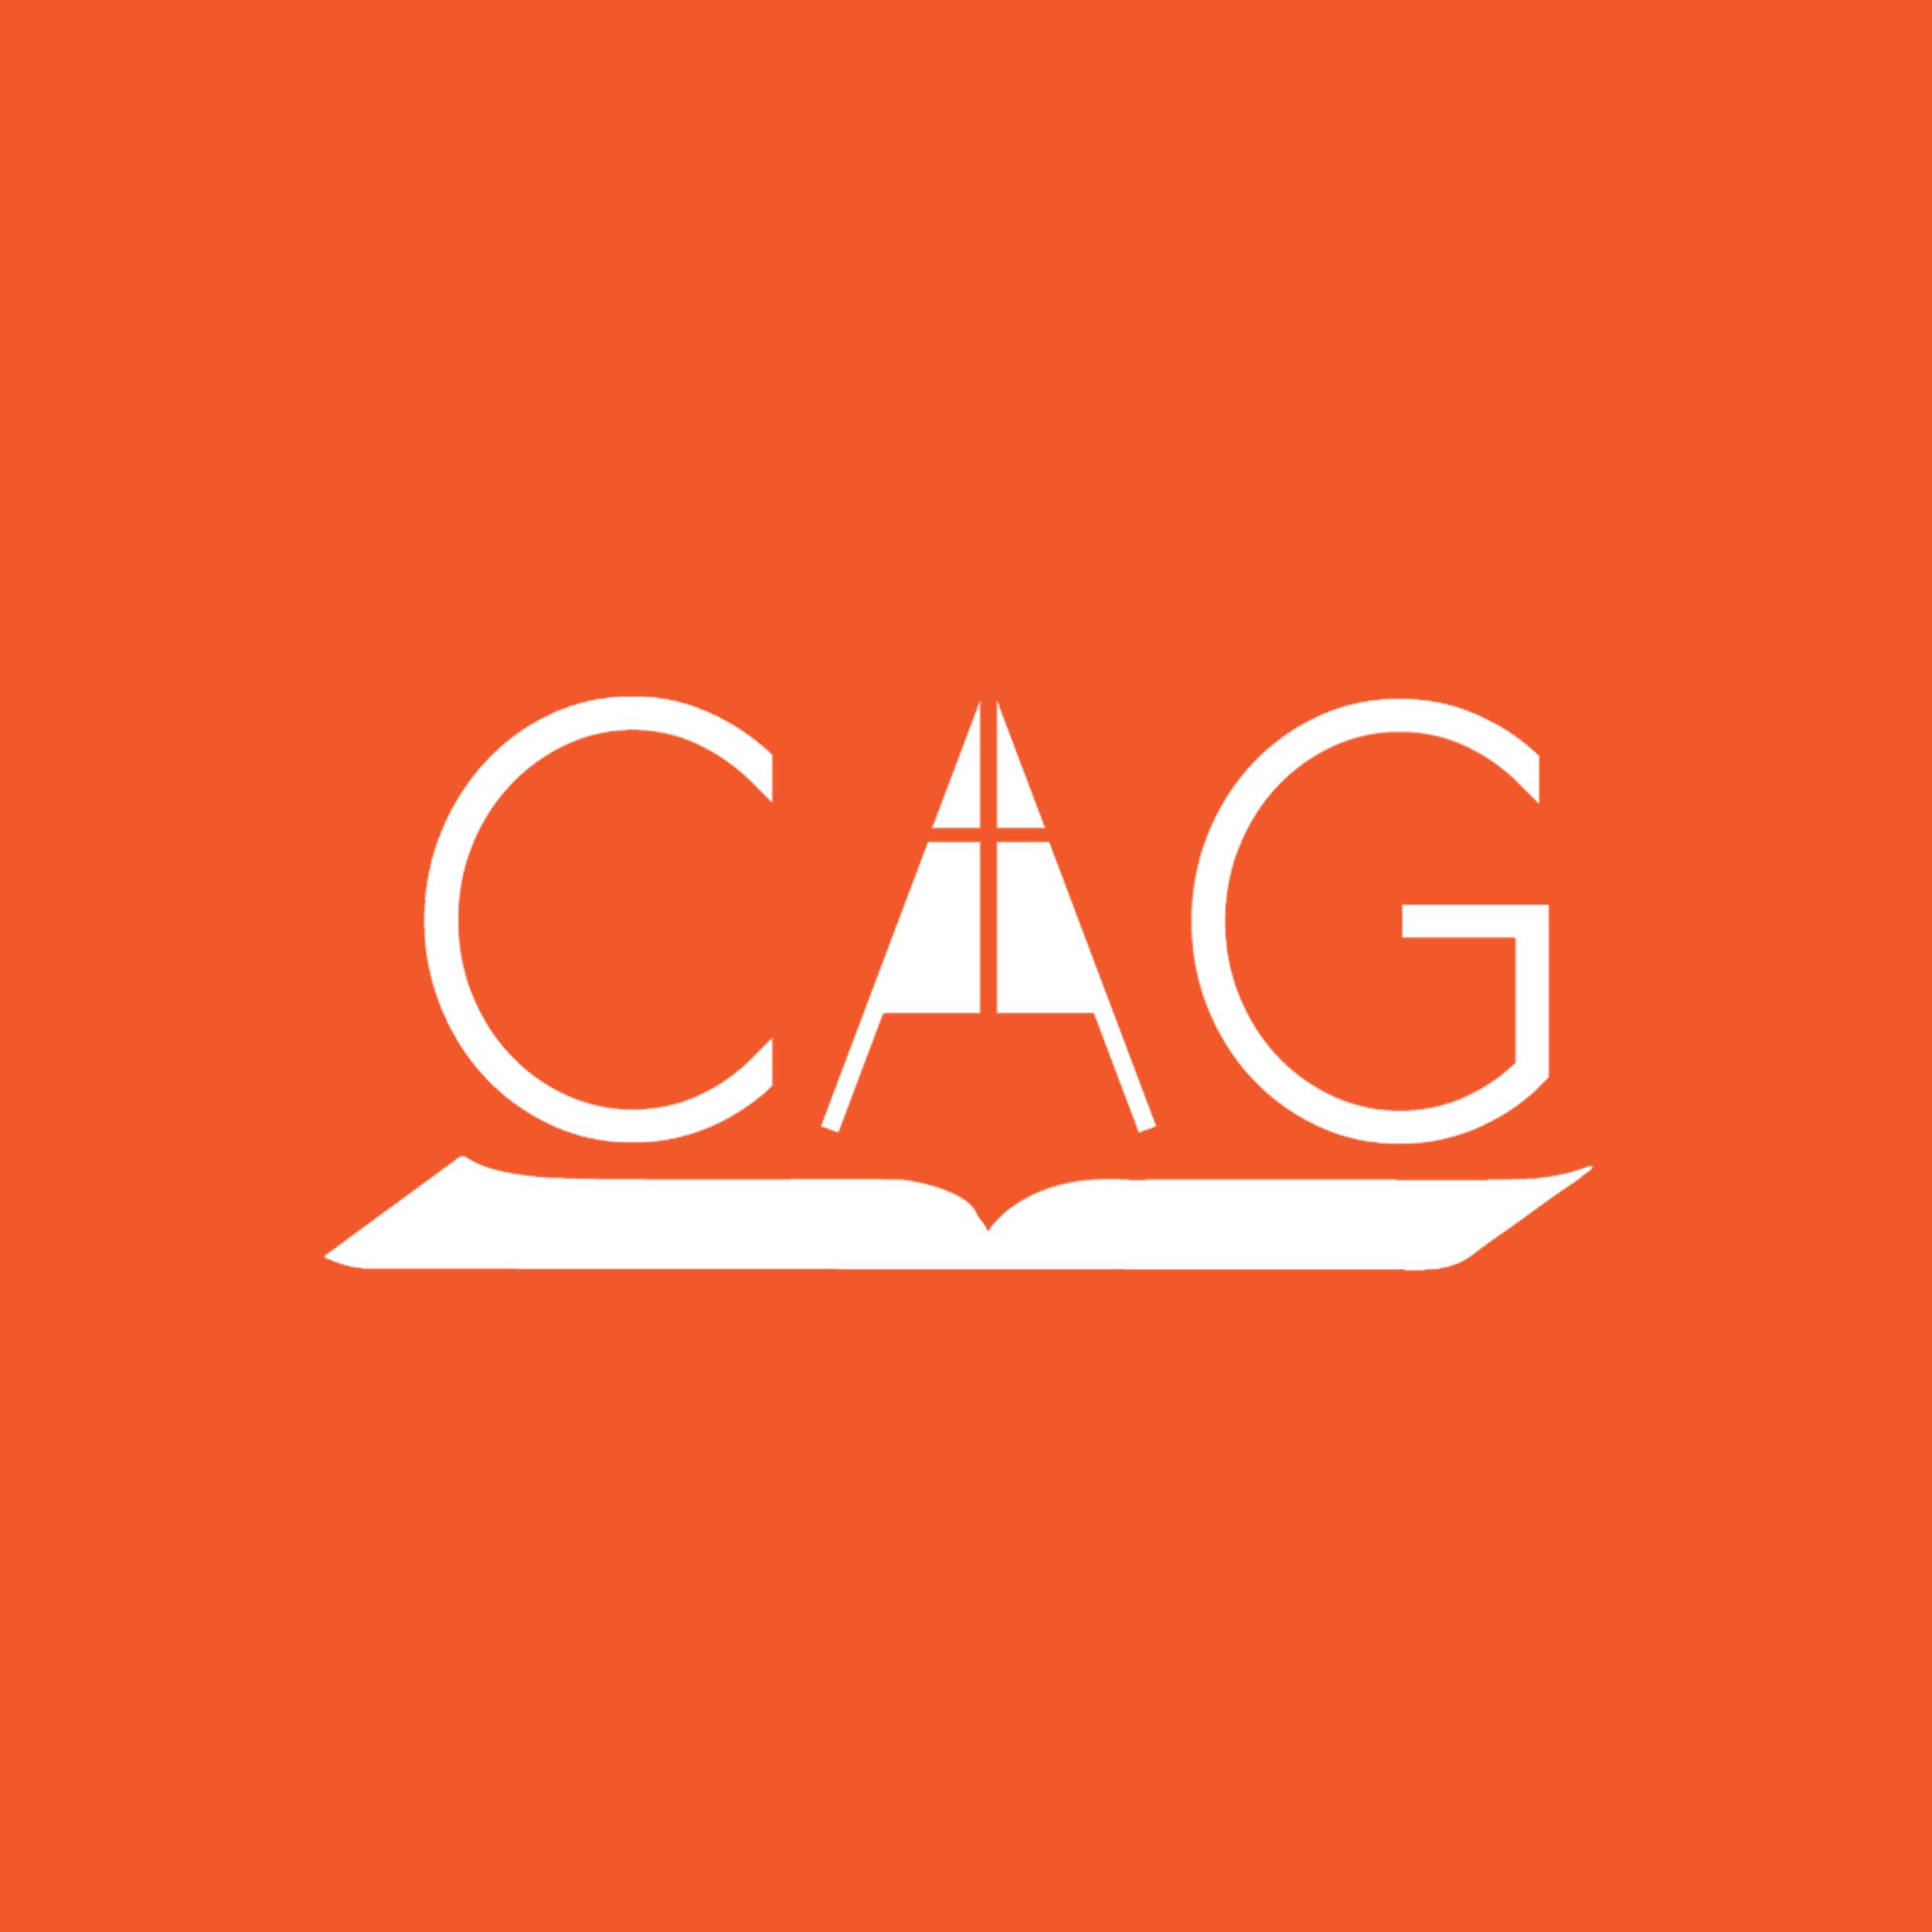 CAG.jpg